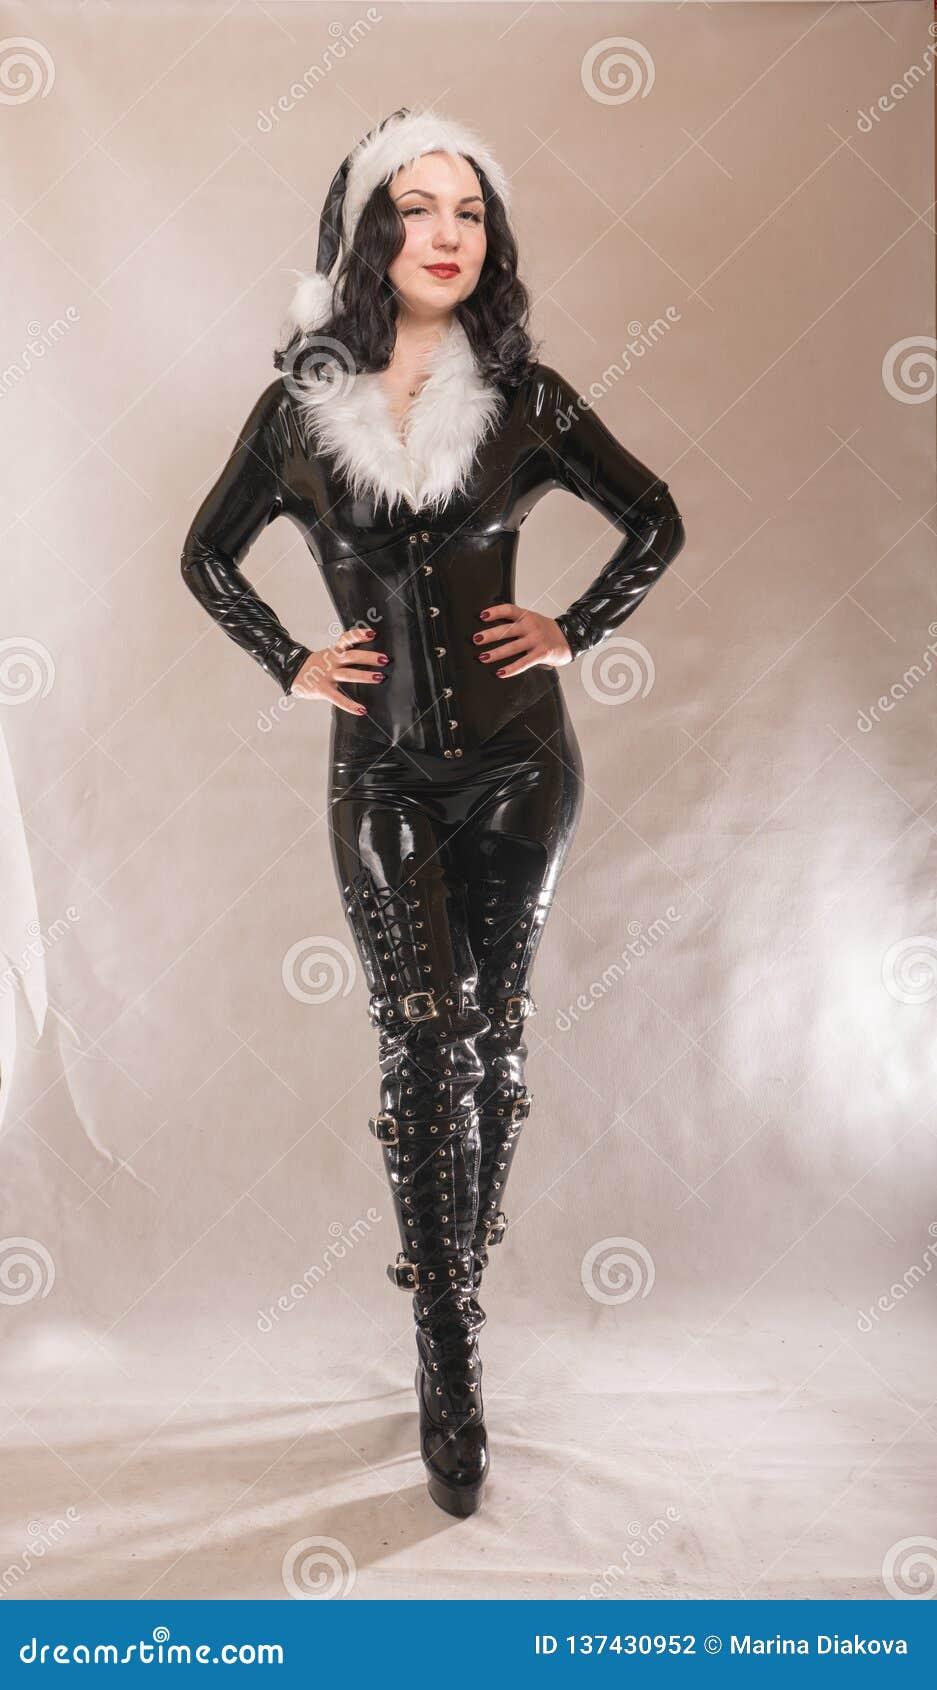 Bad kinky black satna girl posing in latex rubber costume with white fur on dark colorful studio background